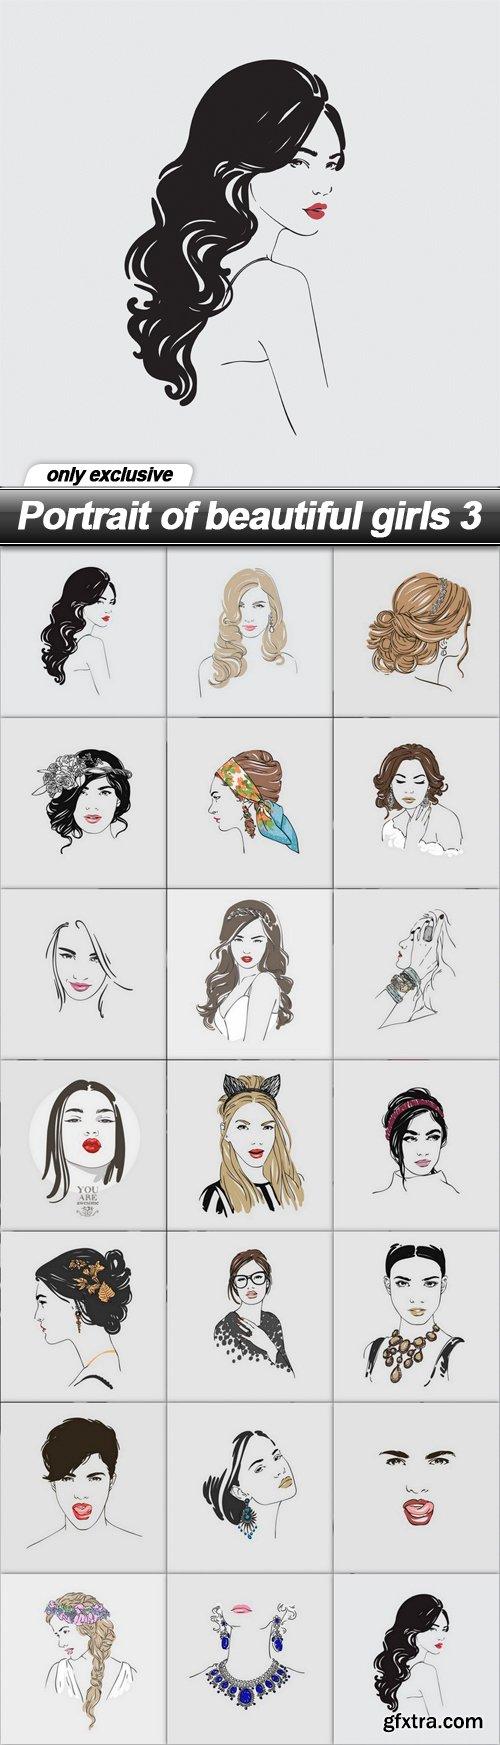 Portrait of beautiful girls 3 - 20 EPS